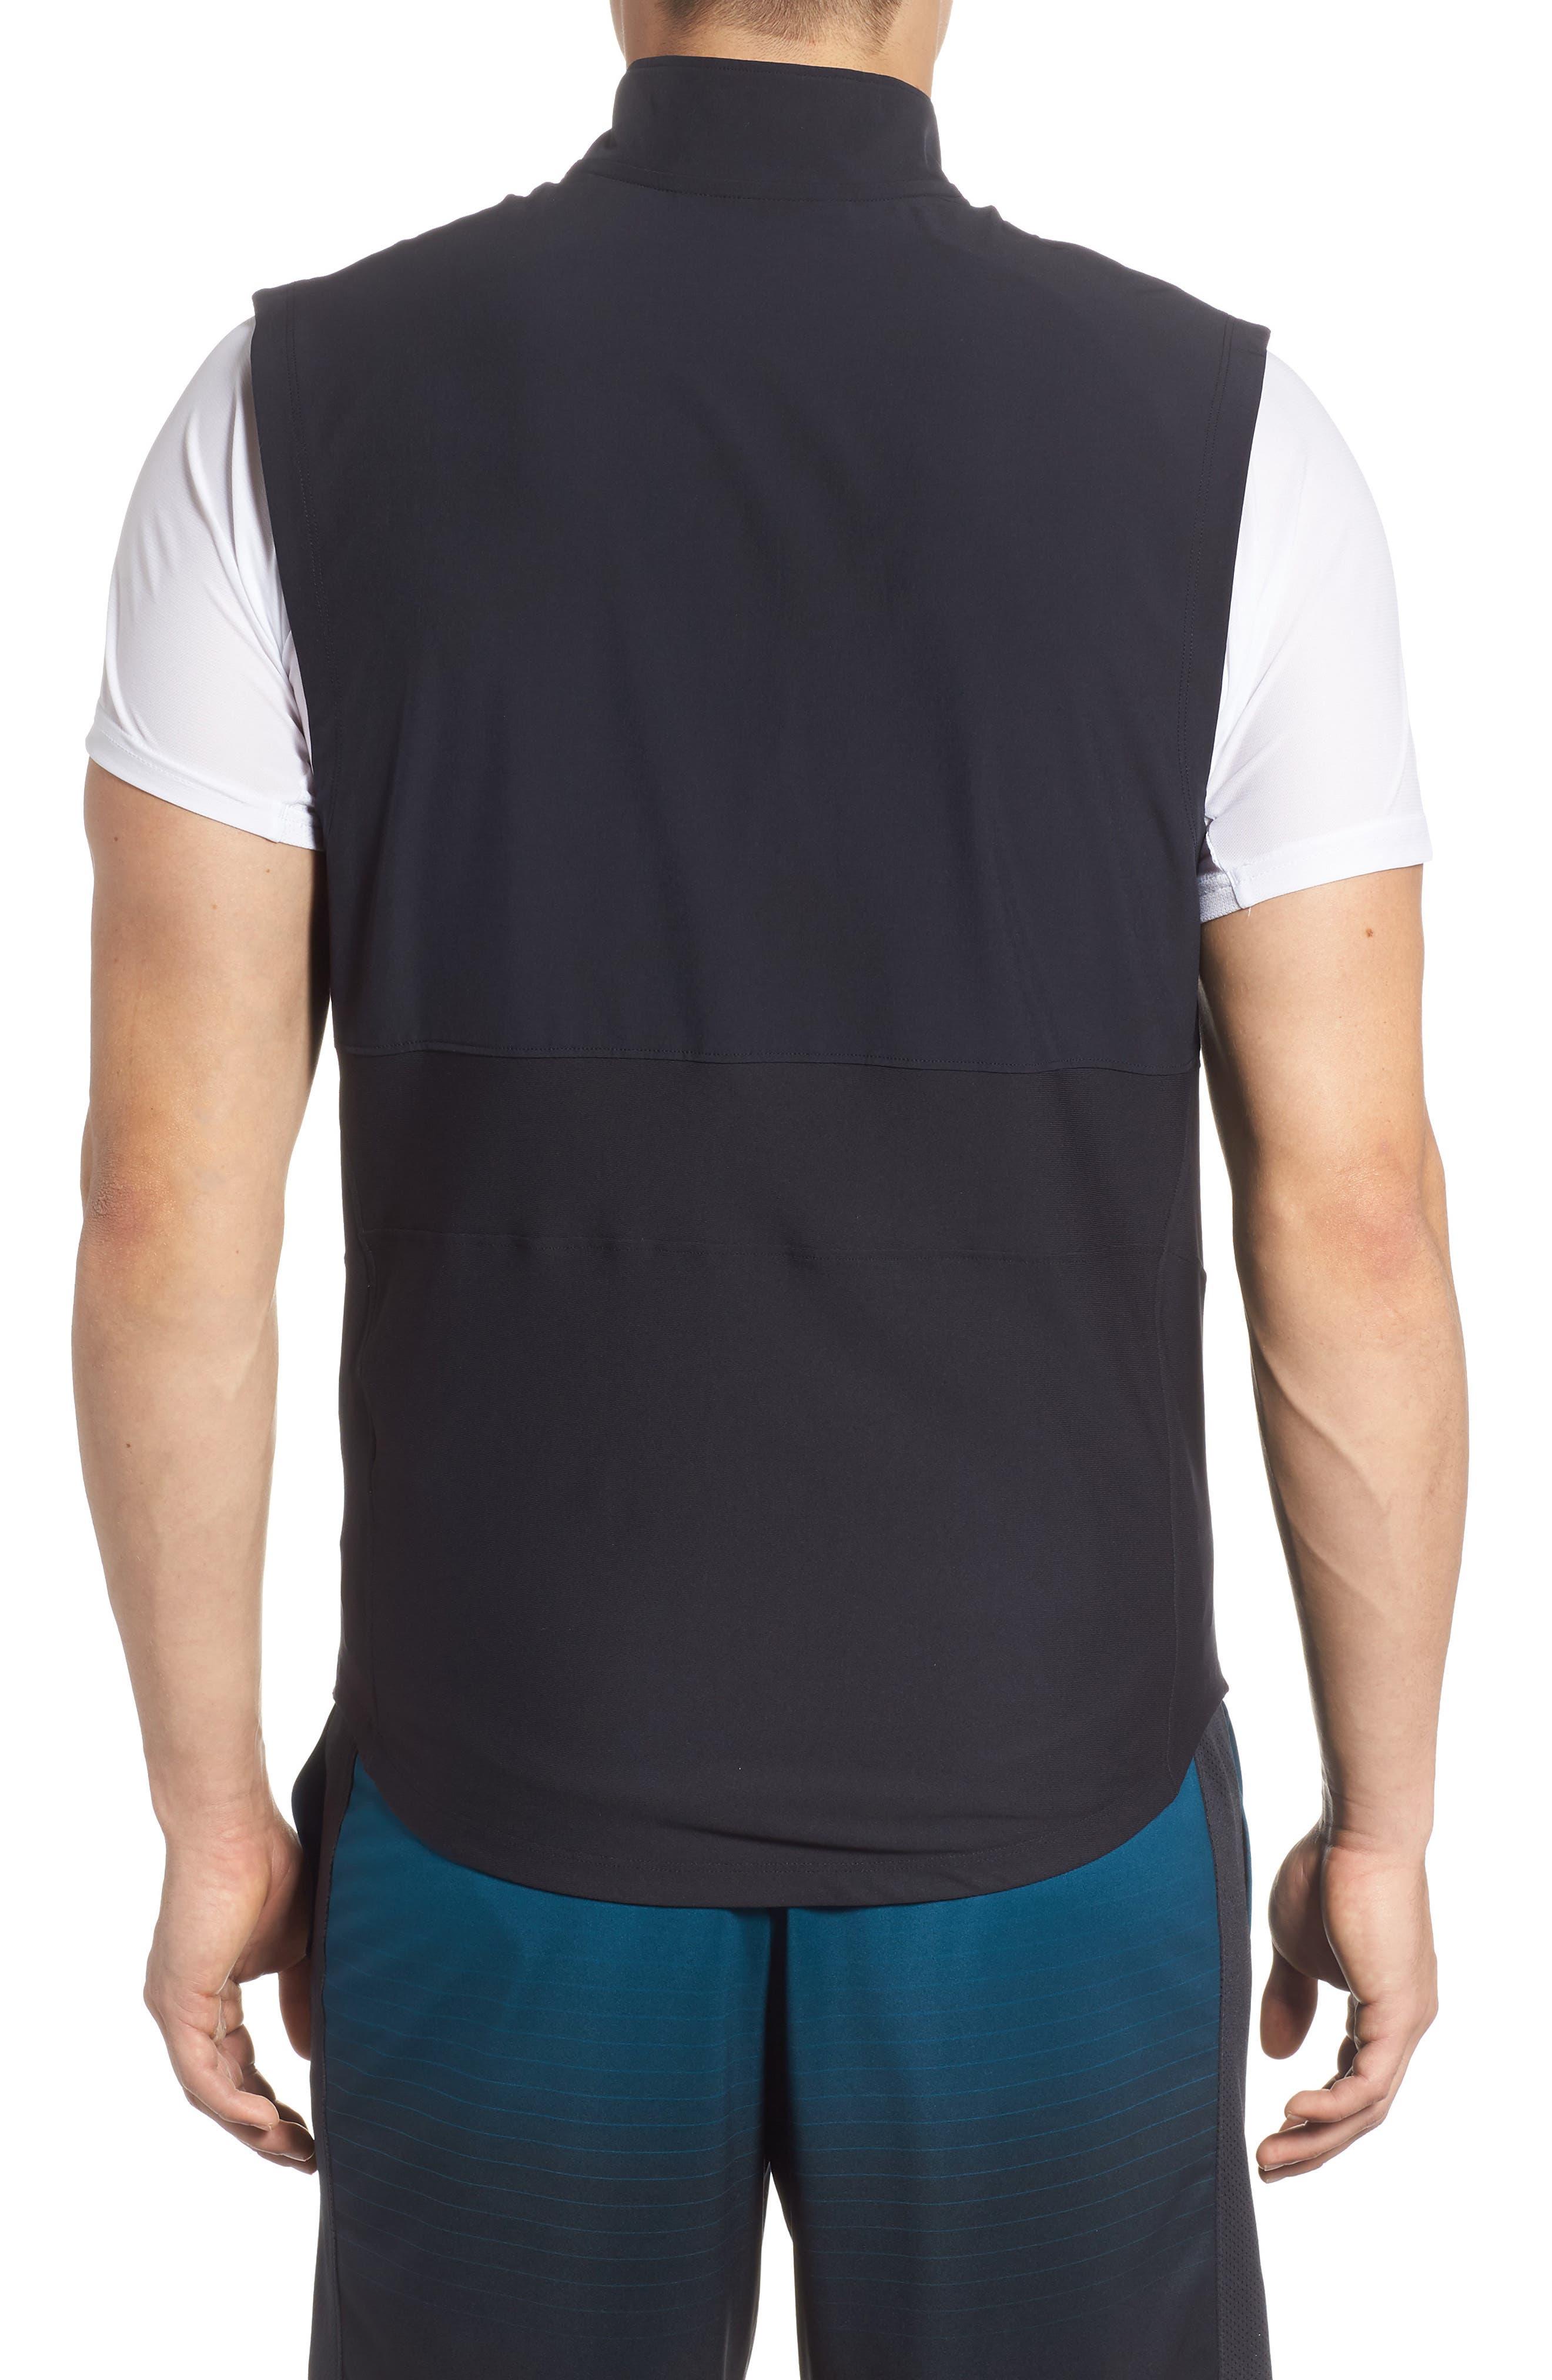 Threadborne Vanish Vest,                             Alternate thumbnail 2, color,                             001